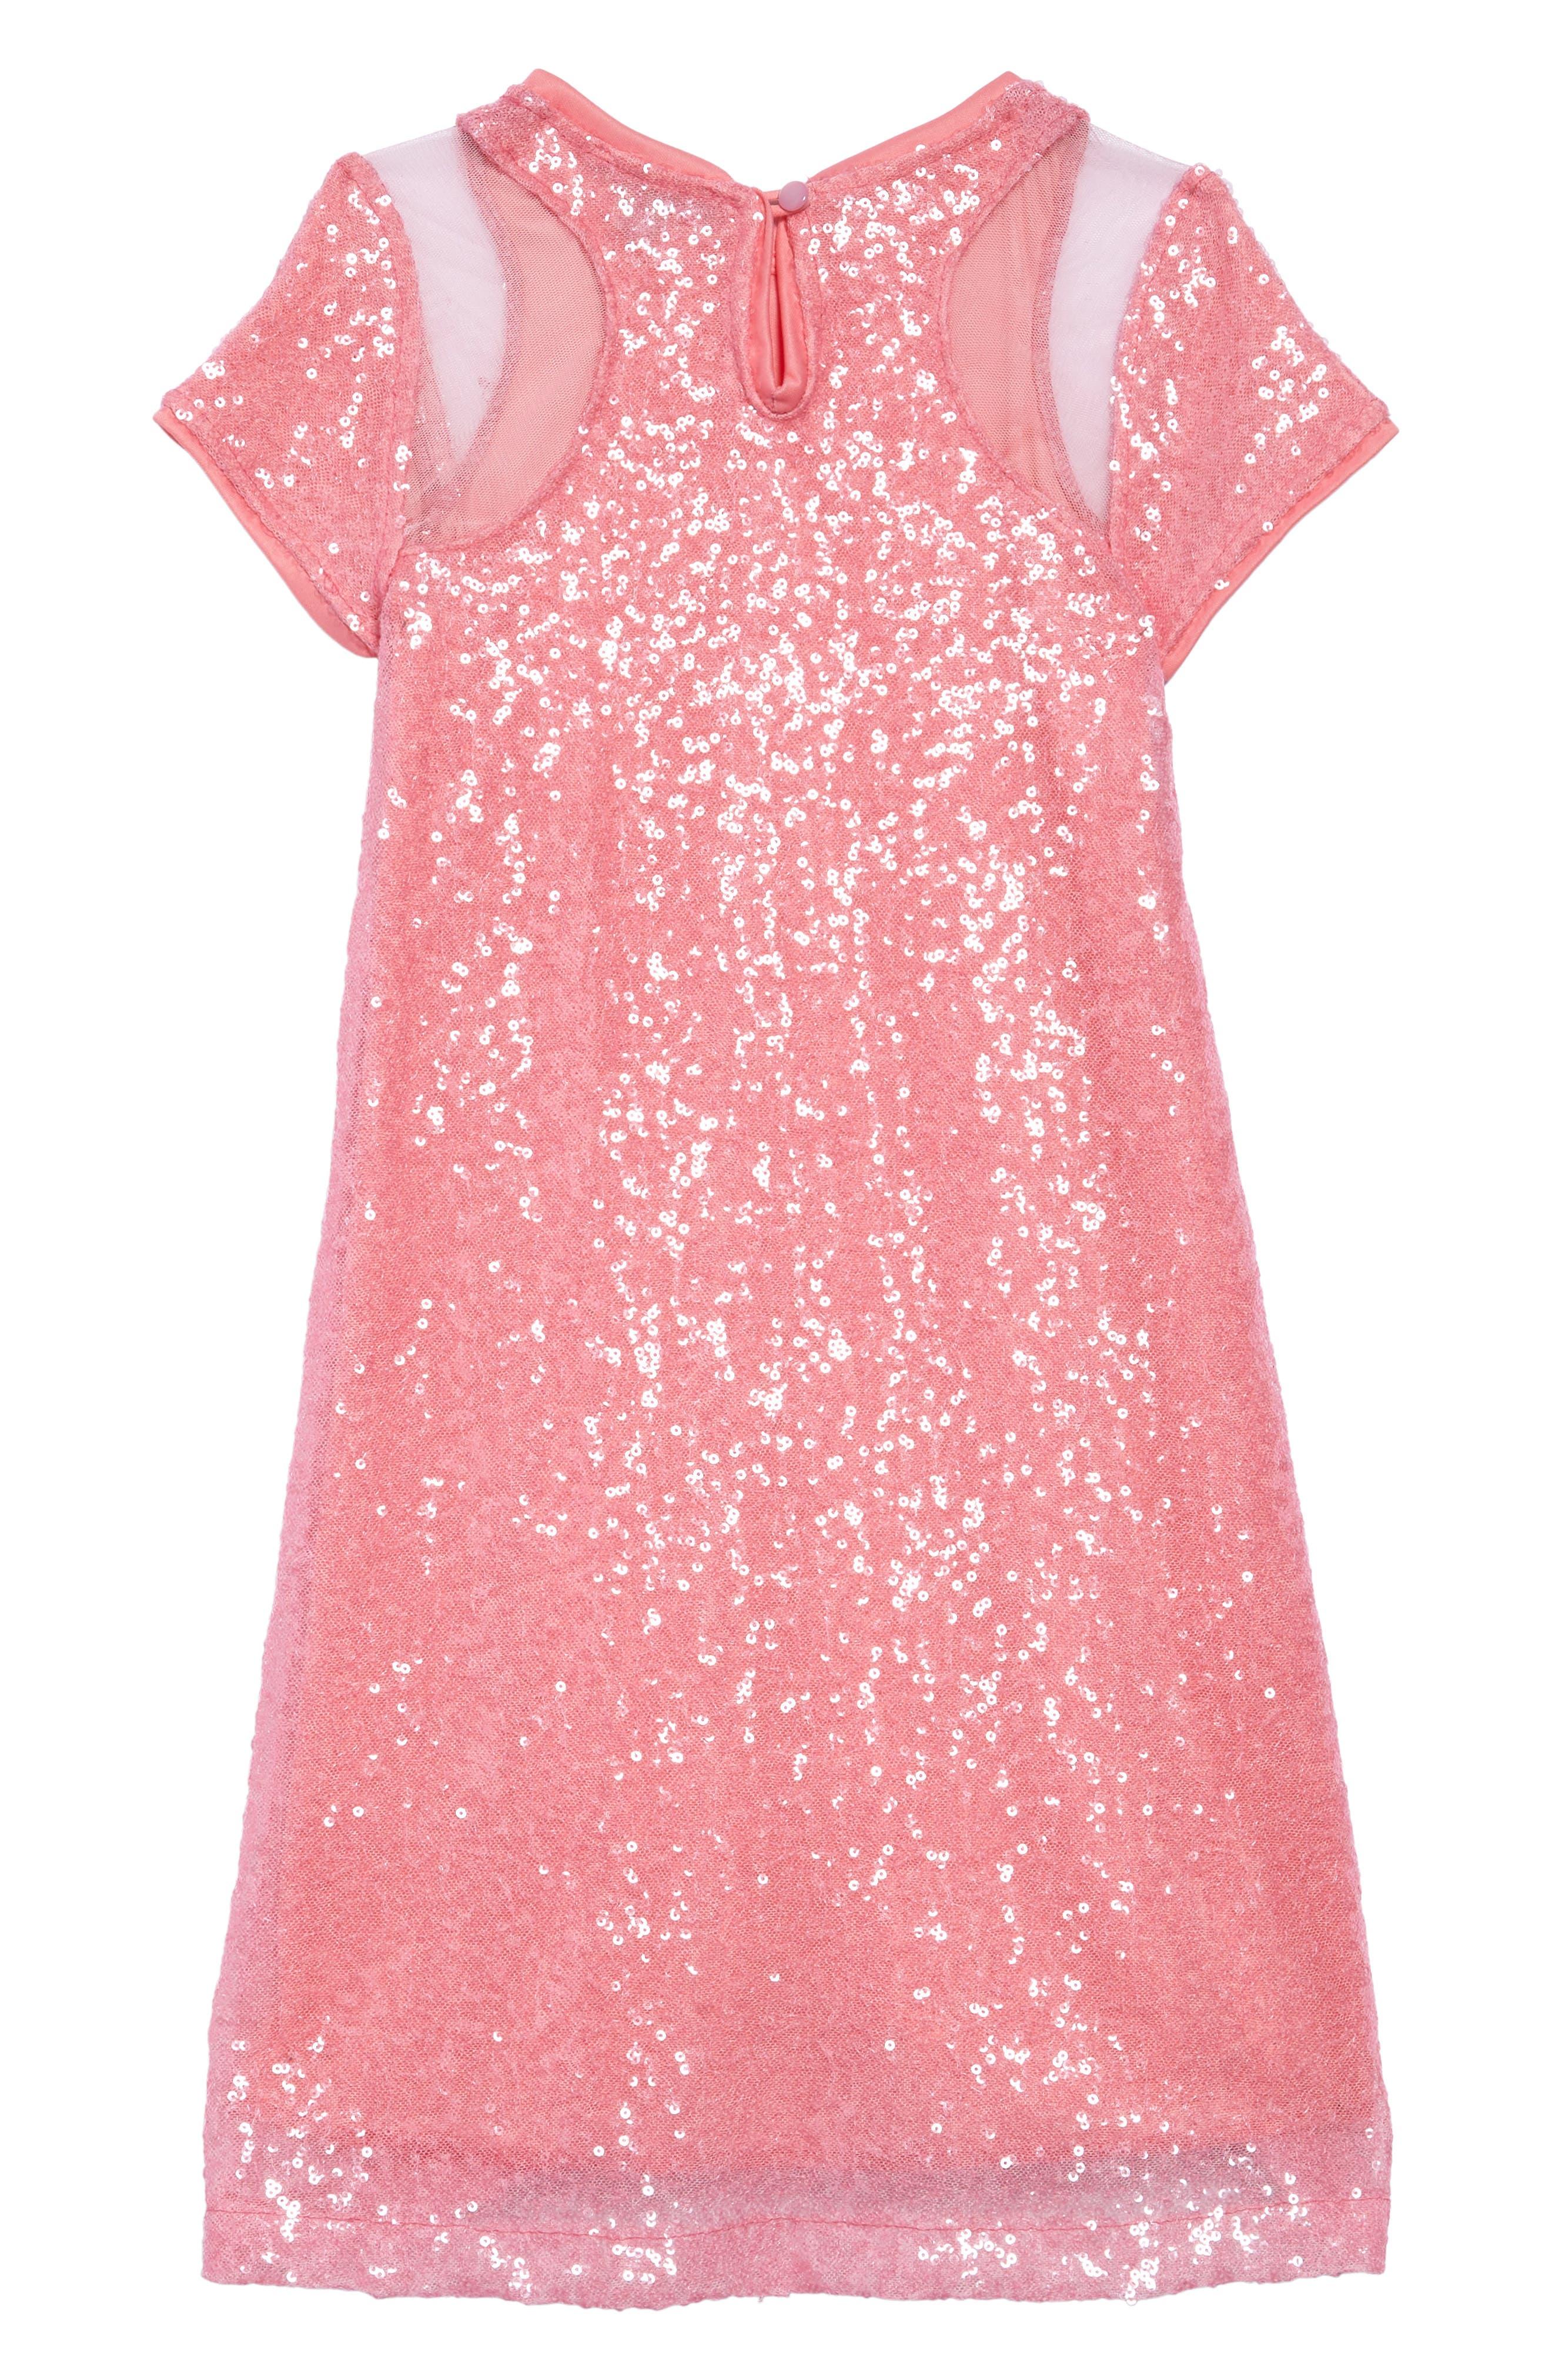 Daisy Sequin Shift Dress,                             Alternate thumbnail 2, color,                             650